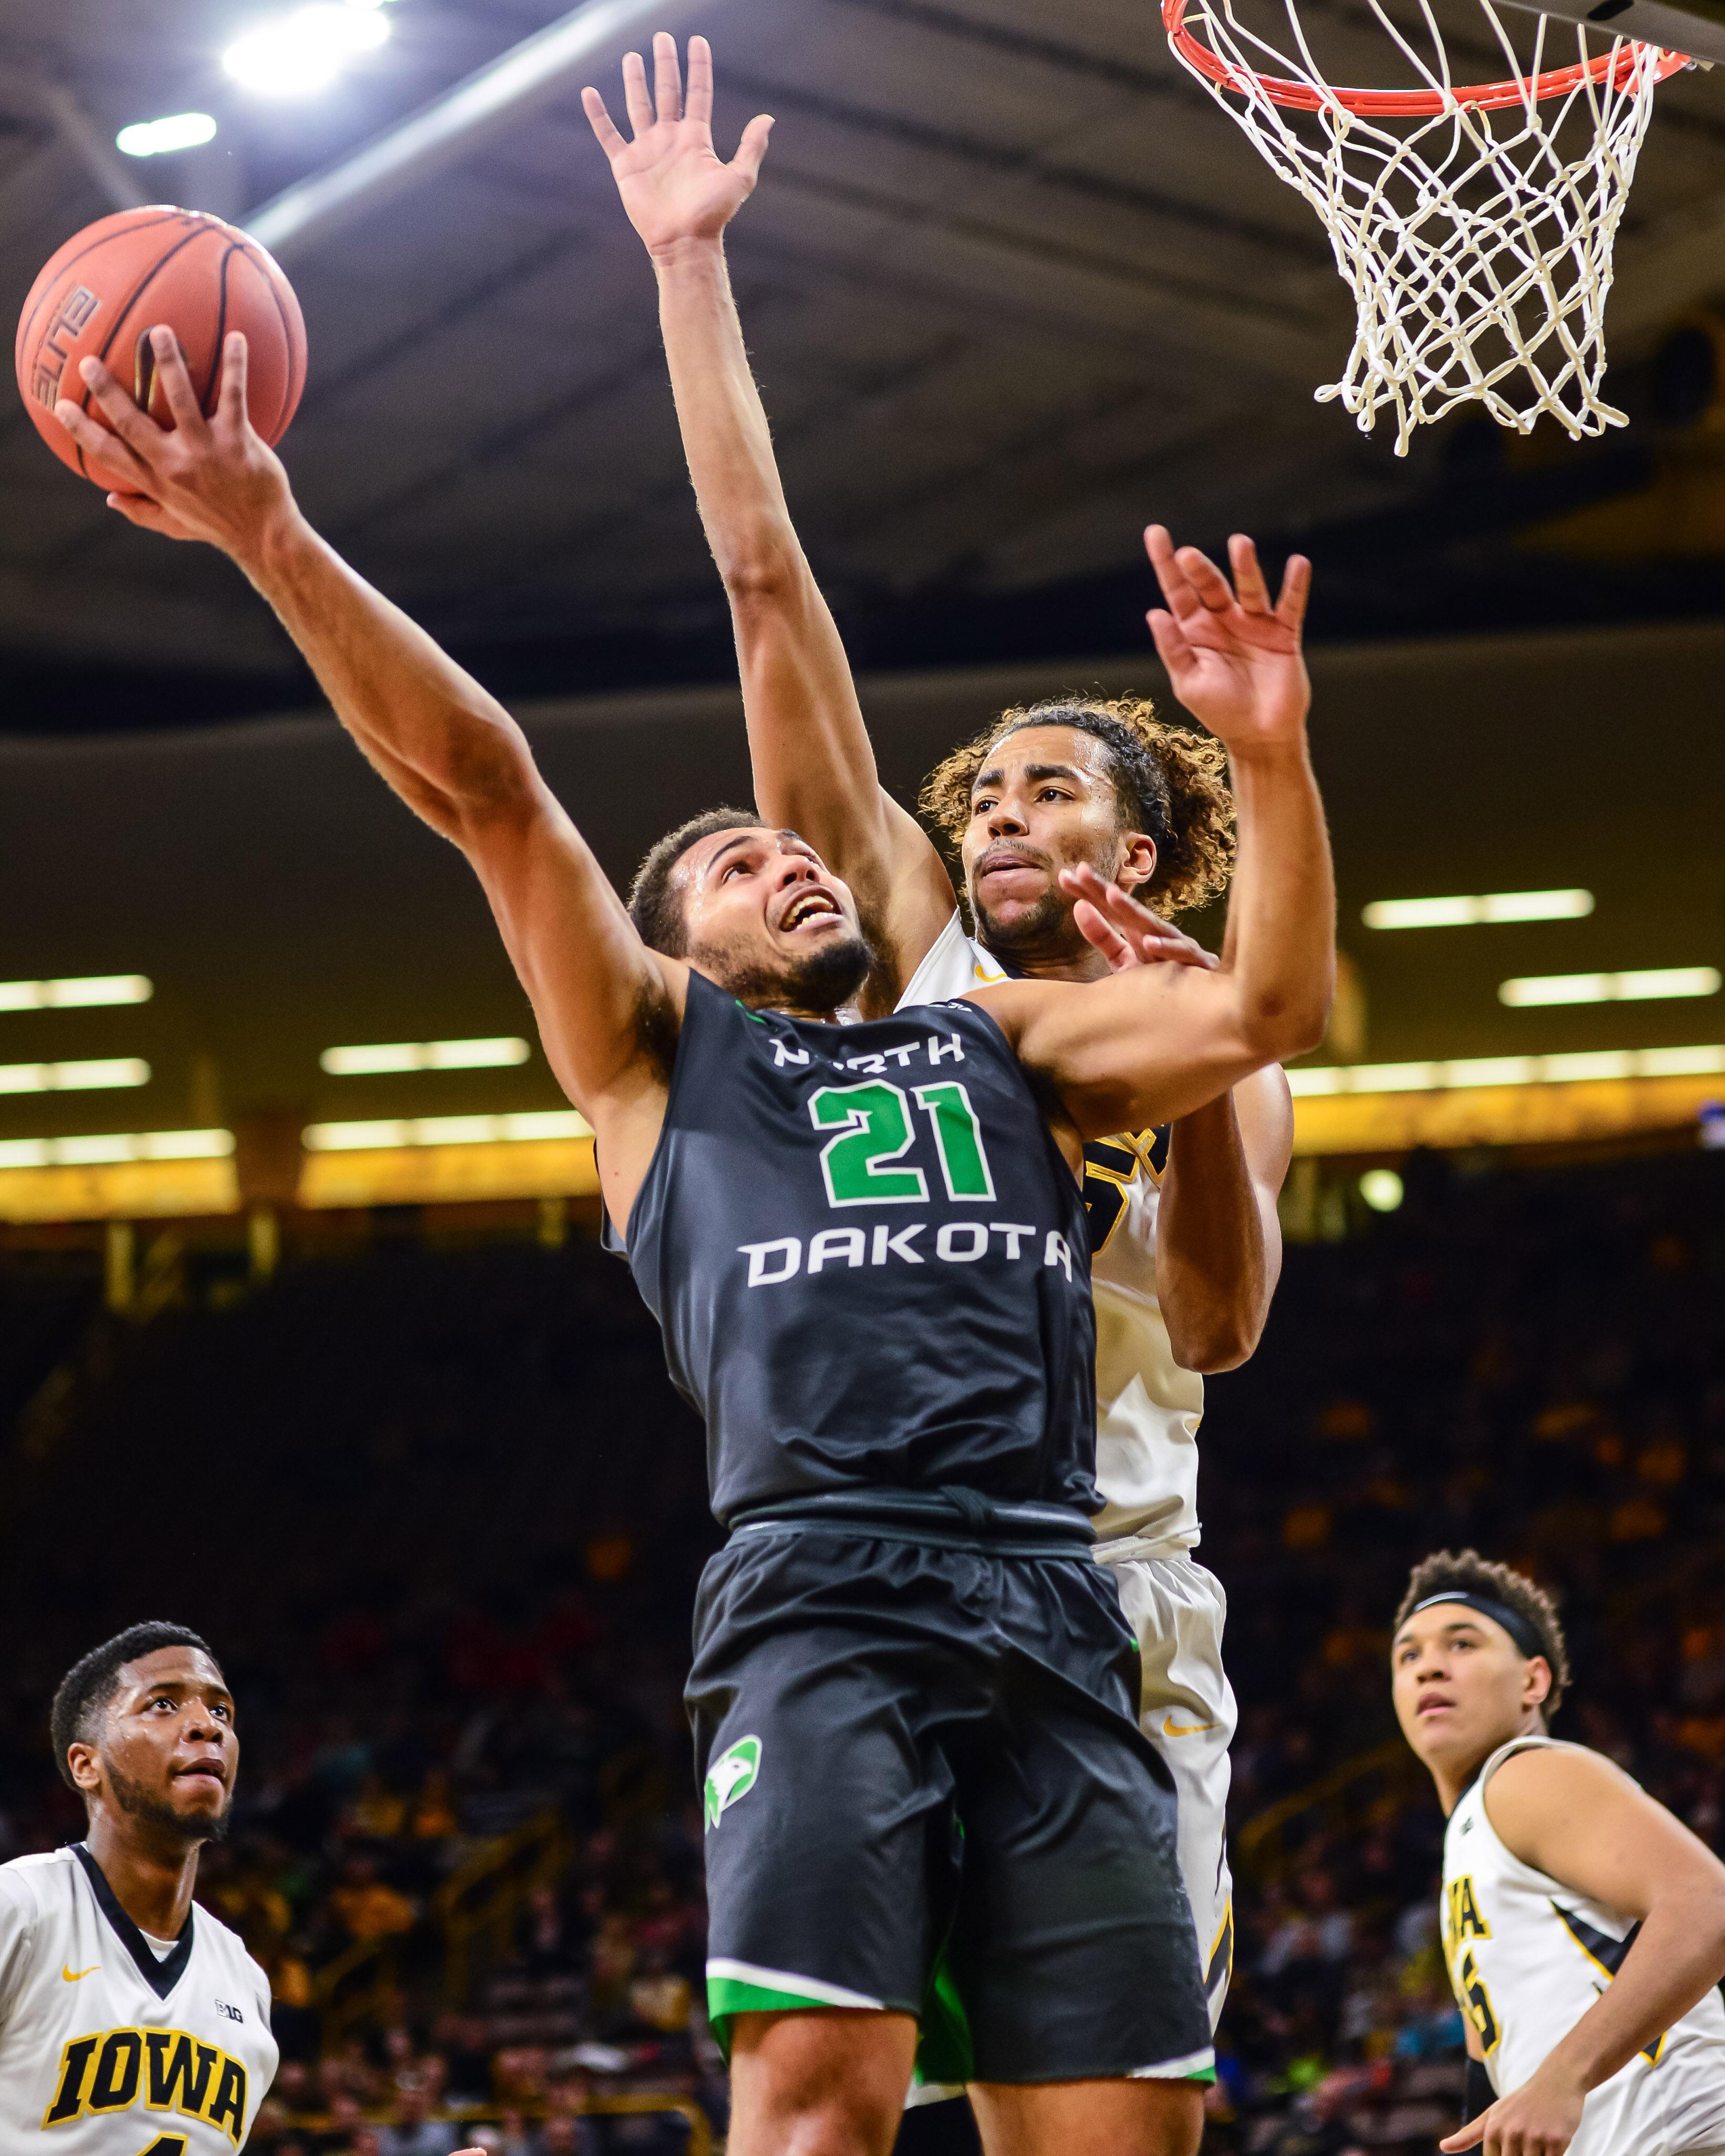 NCAA Basketball: North Dakota at Iowa